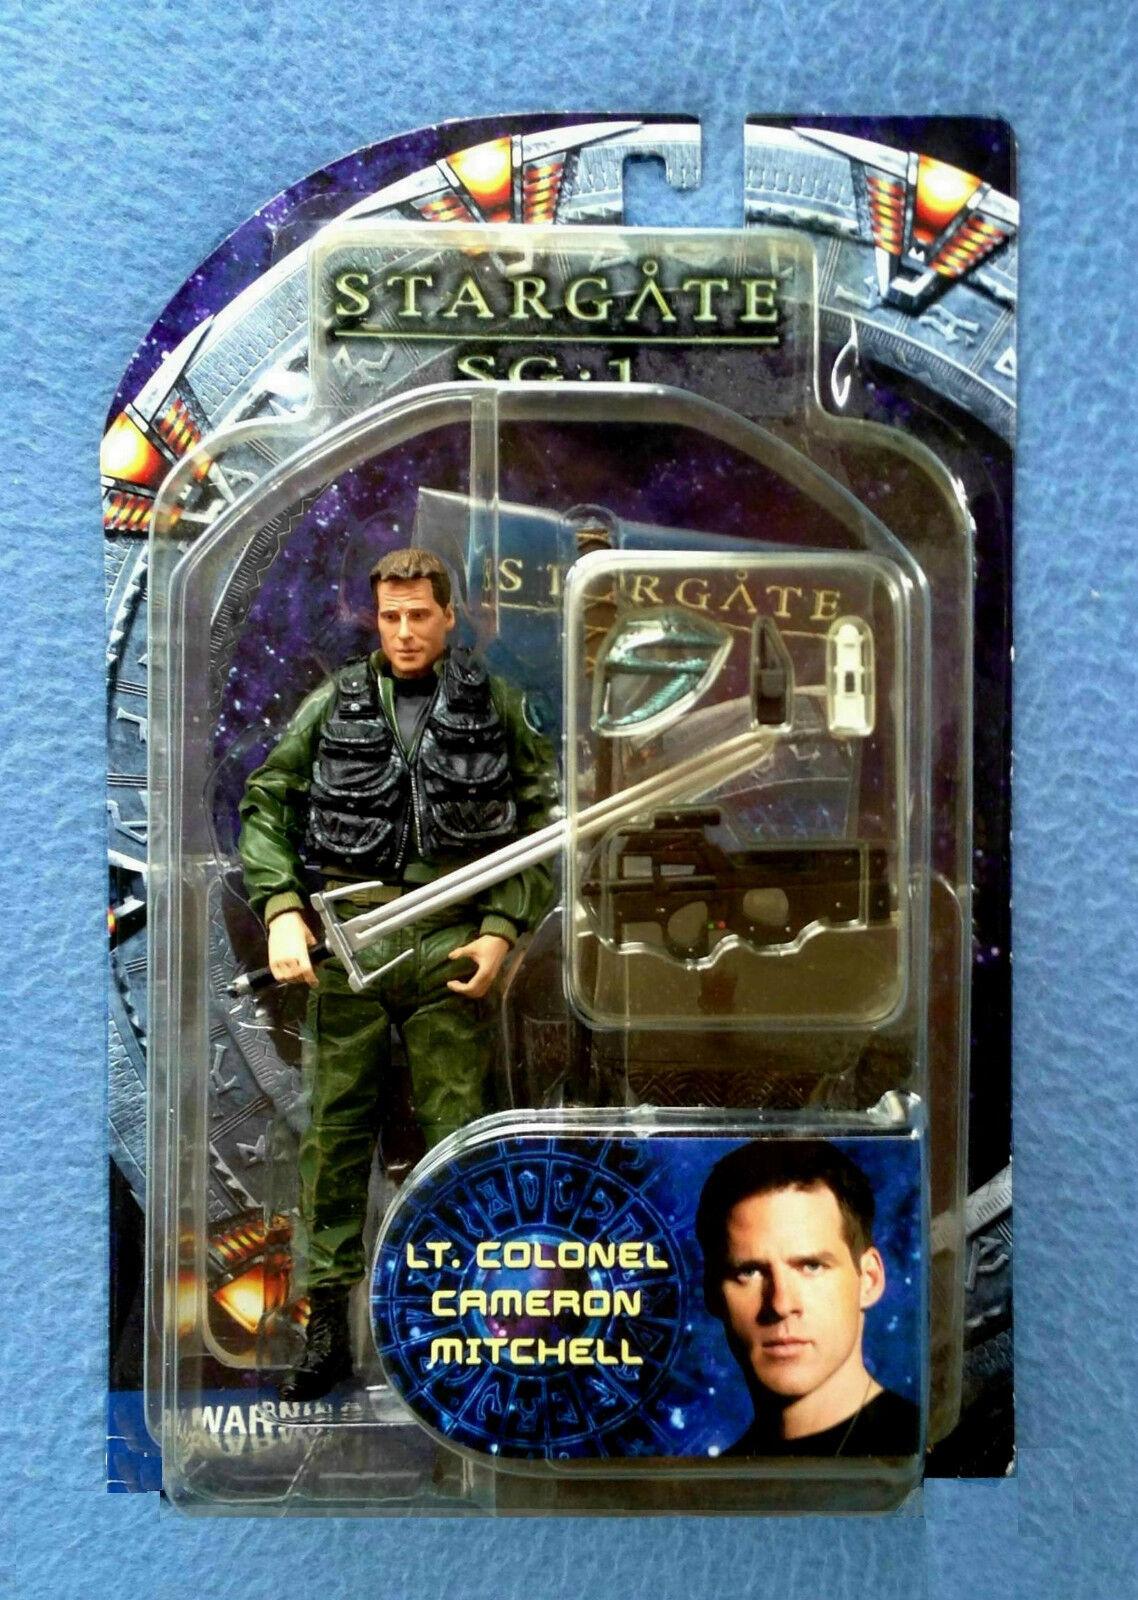 LT. COLONEL CAMERON MITCHELL STARGATE SG-1 DIAMOND SELECT MILITARY 6.5